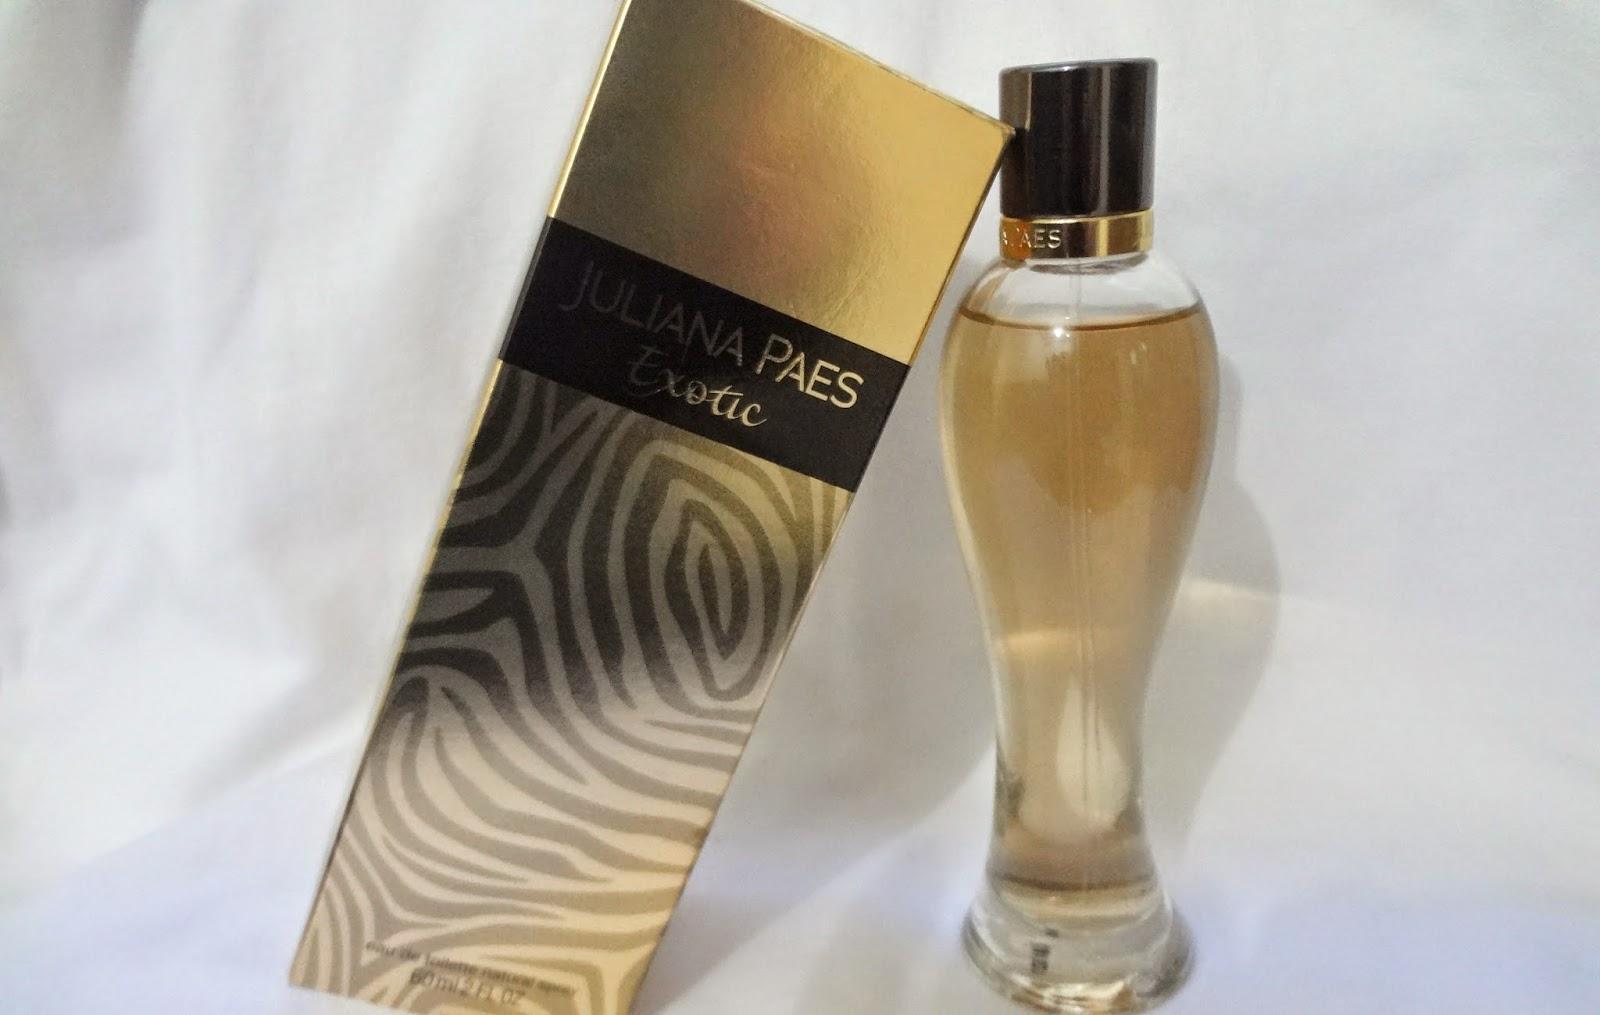 perfume+juliana+paes+exotic+%C3%A9+bom-p